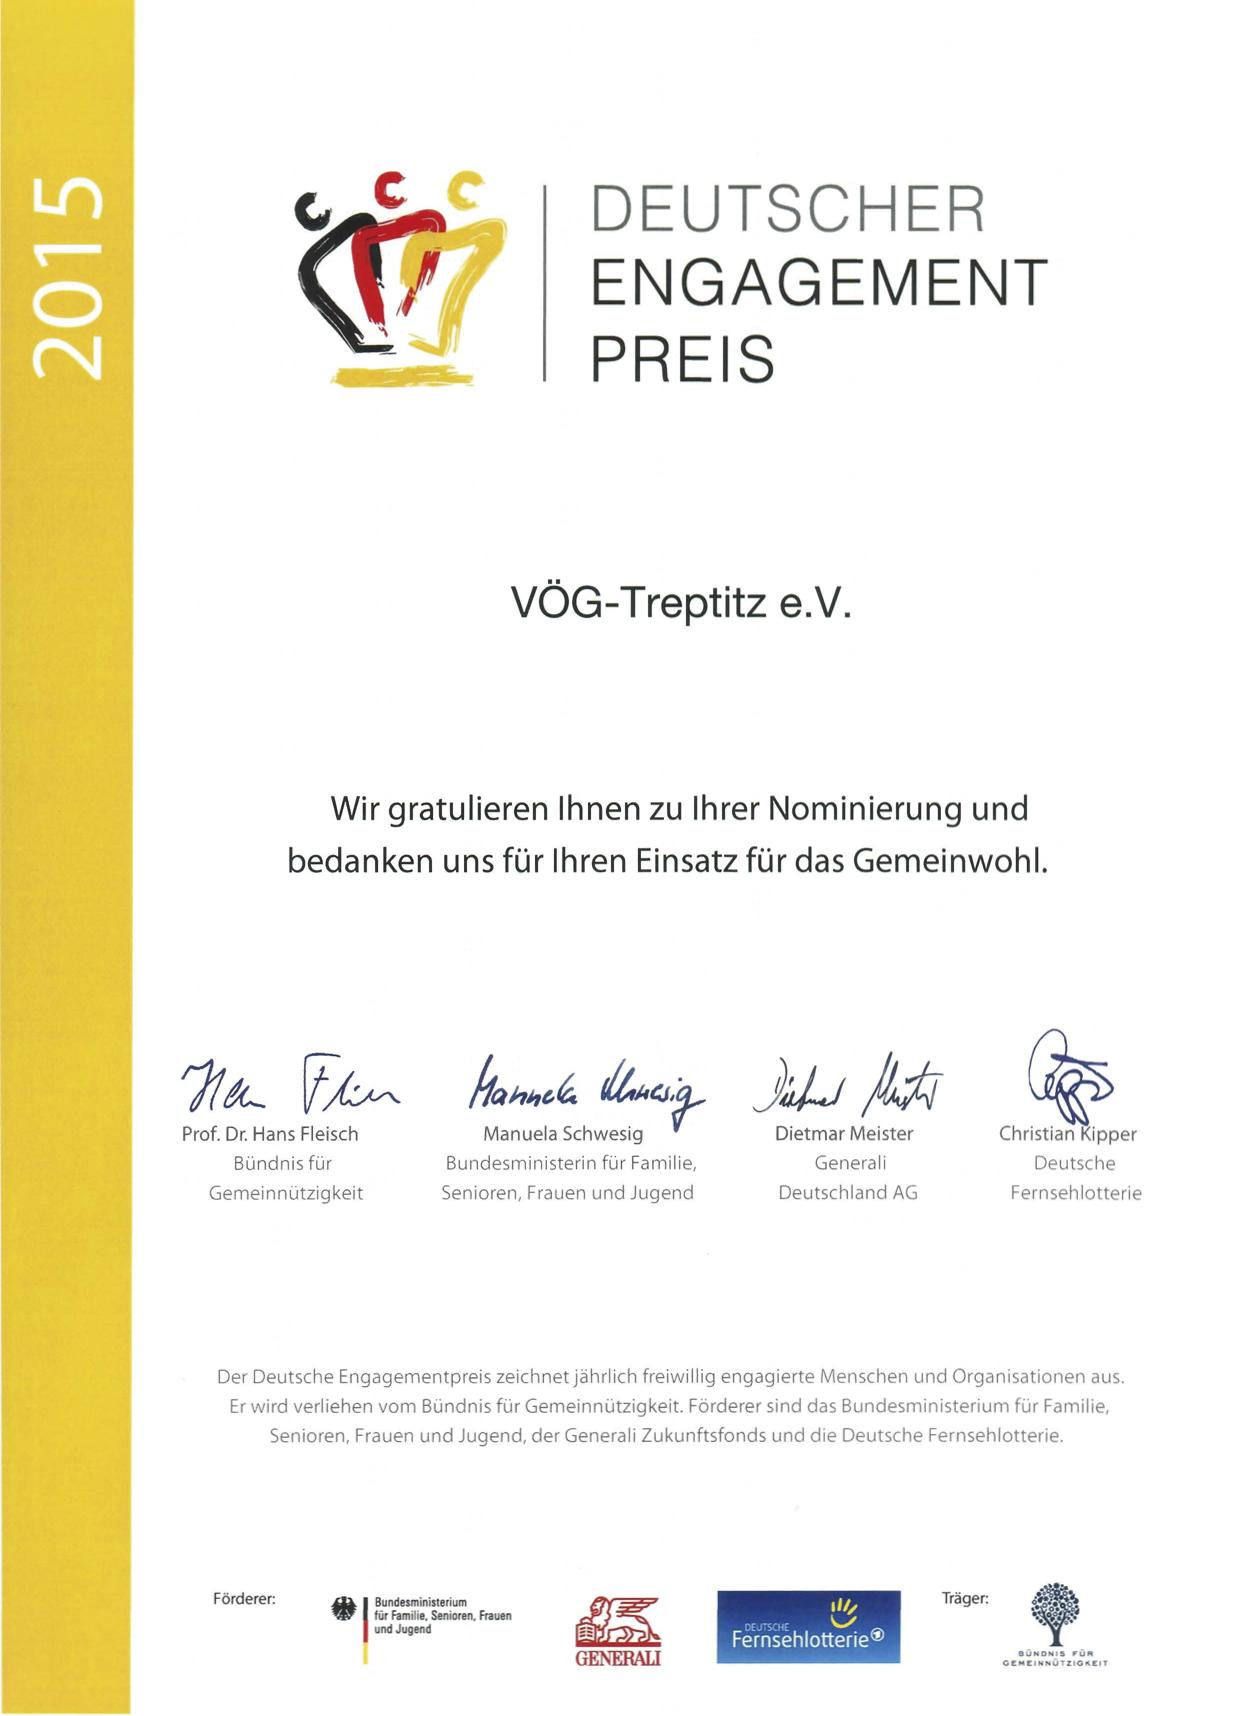 Urkunde_Engagementpreis_2015_vög_treptitz